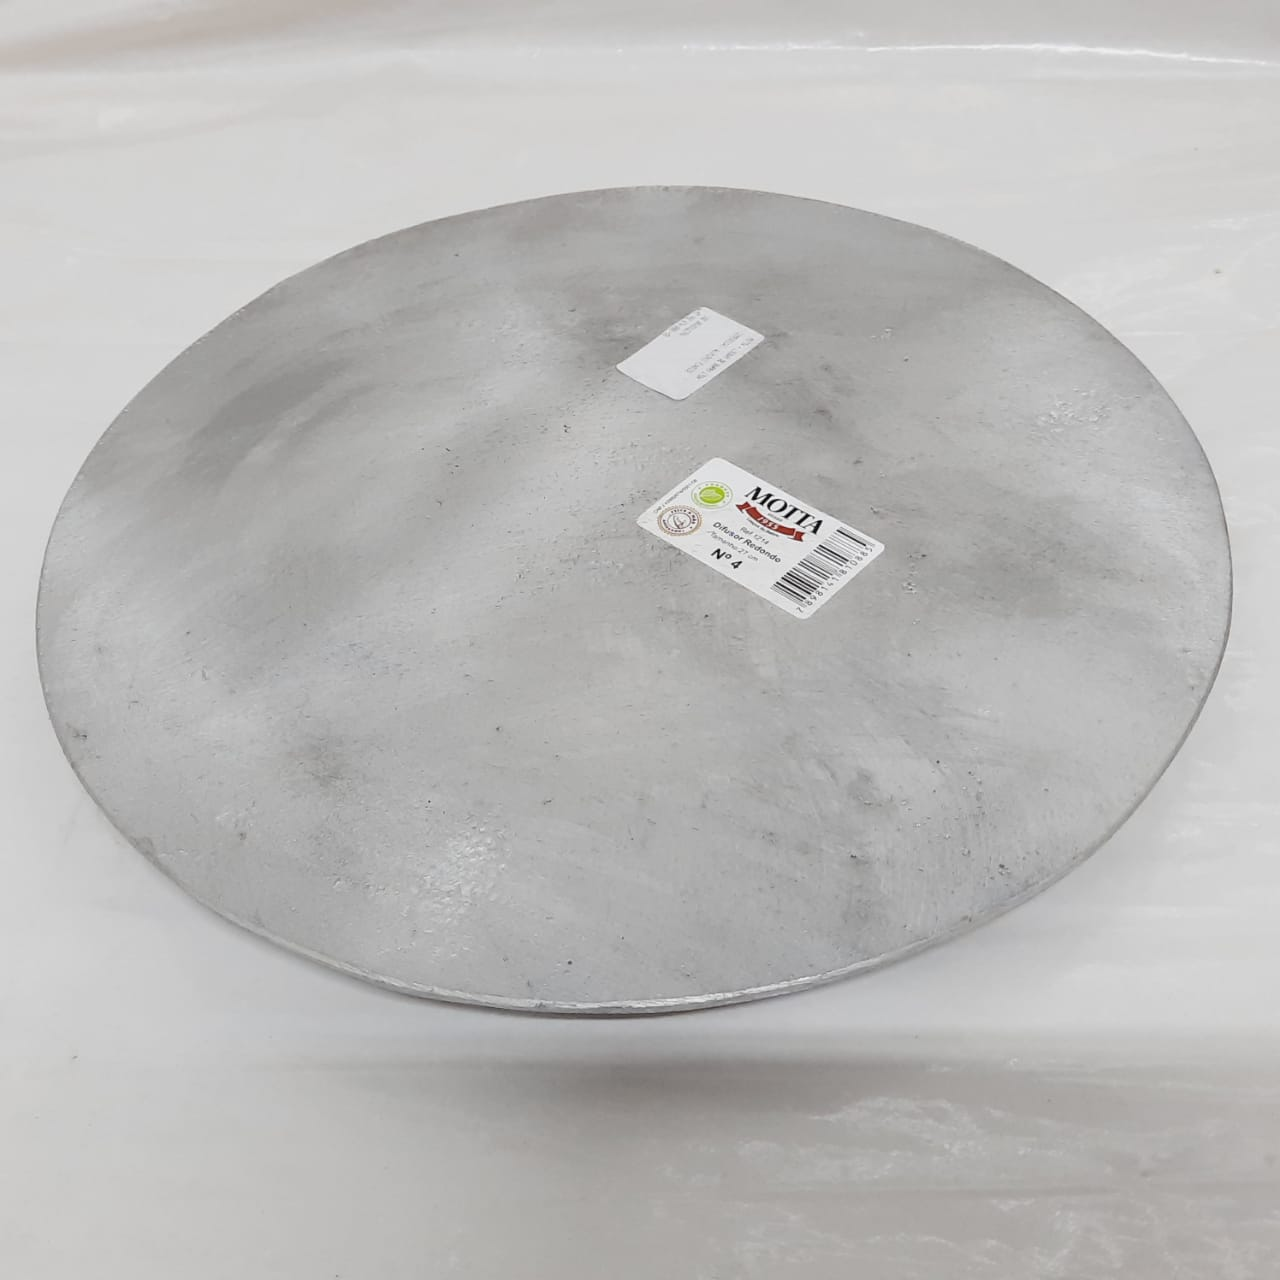 Difusor Alumínio Chamas P/FOG N 04 MOTTA